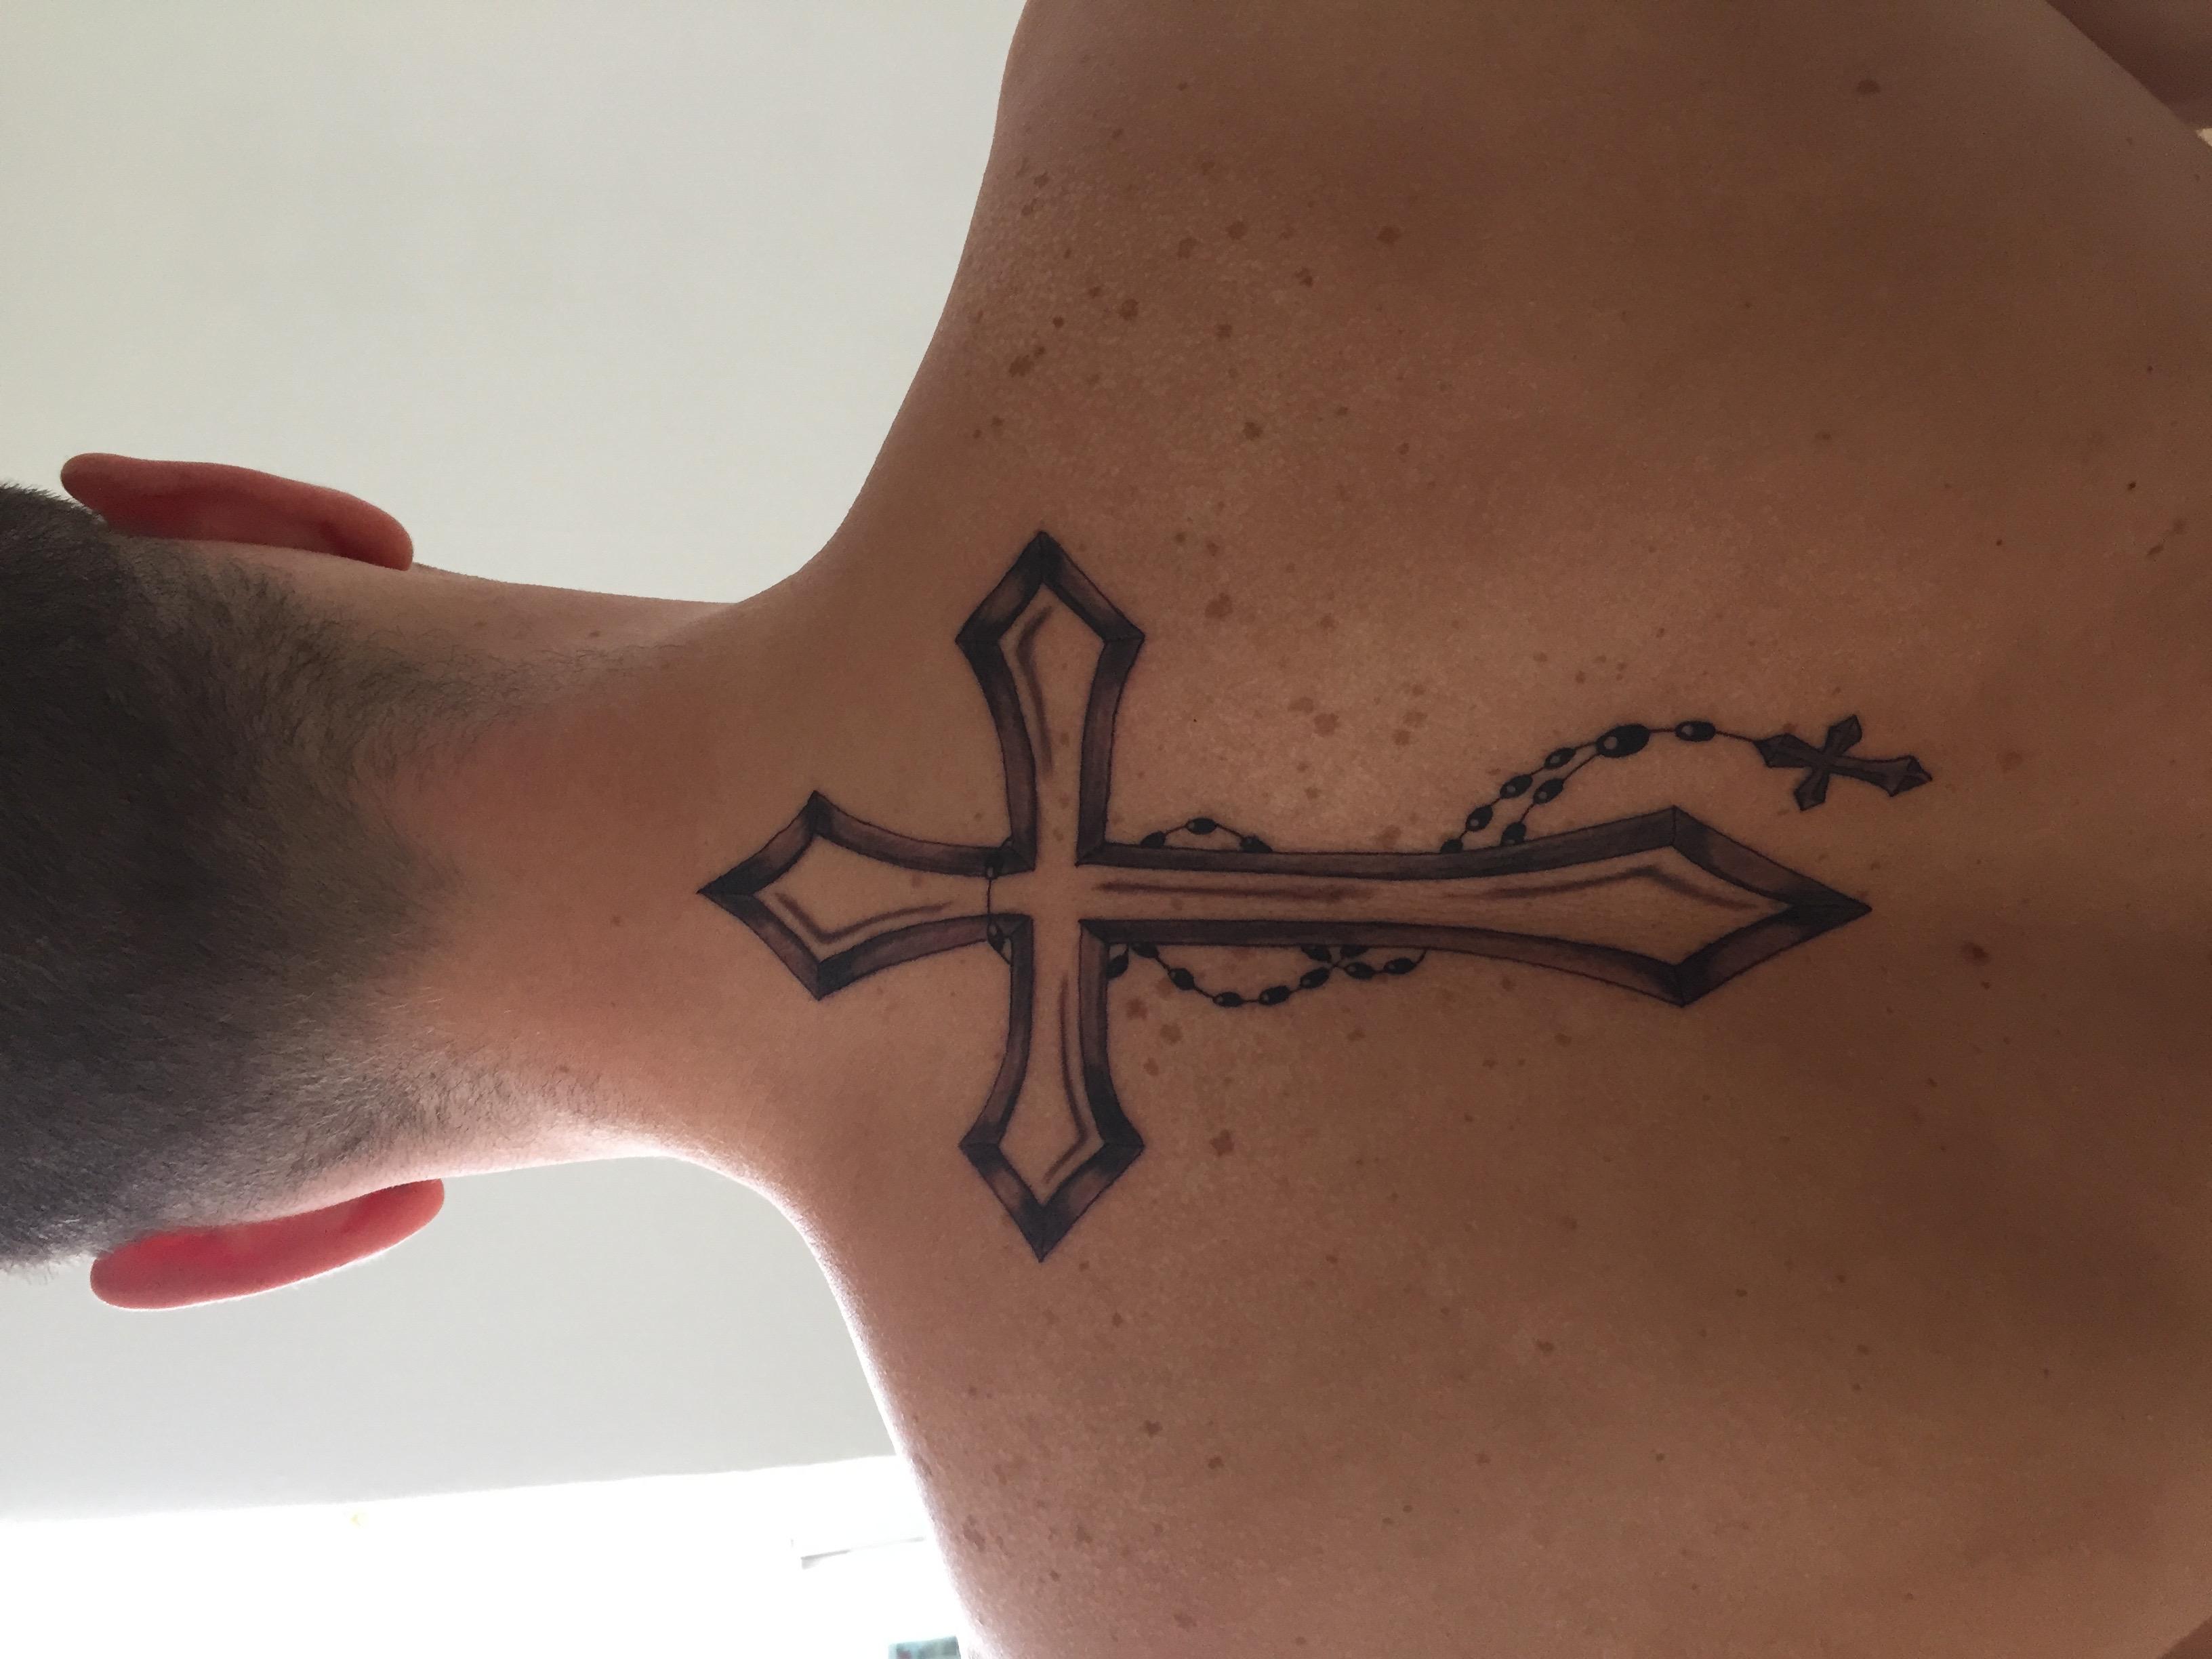 Kreuz am hals tattoo | 75+ kreative Hals Tattoos für